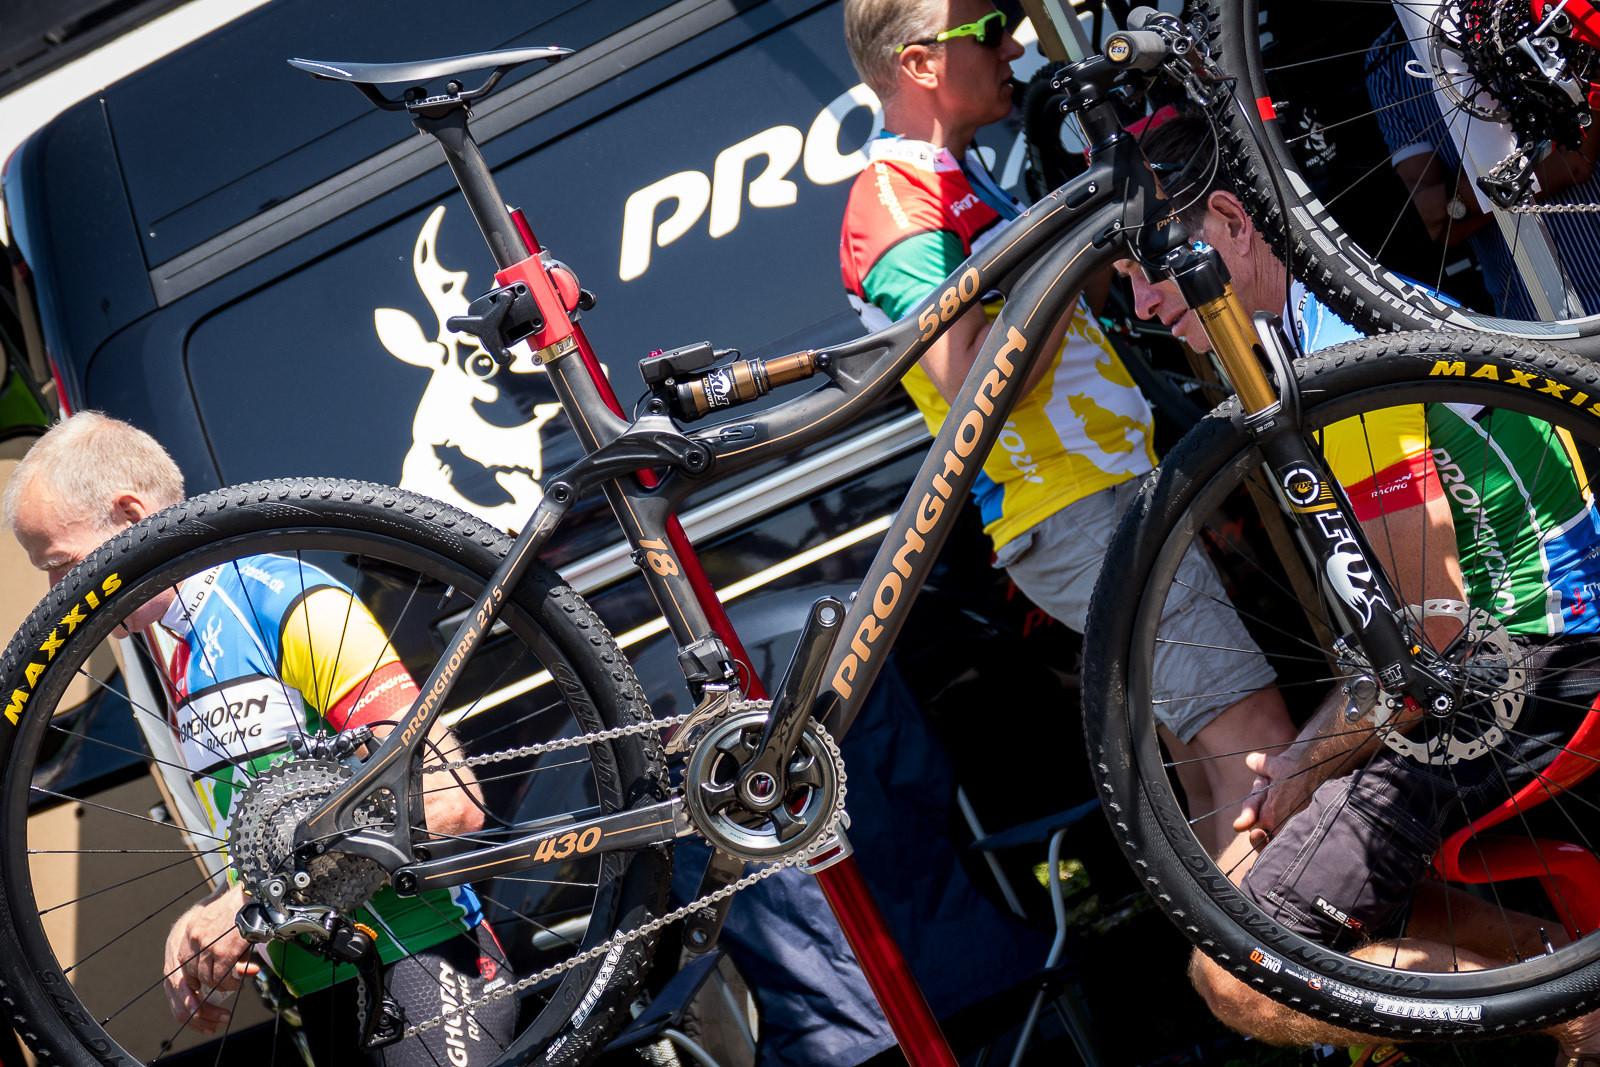 2016 Pronghorn 27.5 - 2016 Trail, All-Mountain & Enduro Bikes at Eurobike - Mountain Biking Pictures - Vital MTB